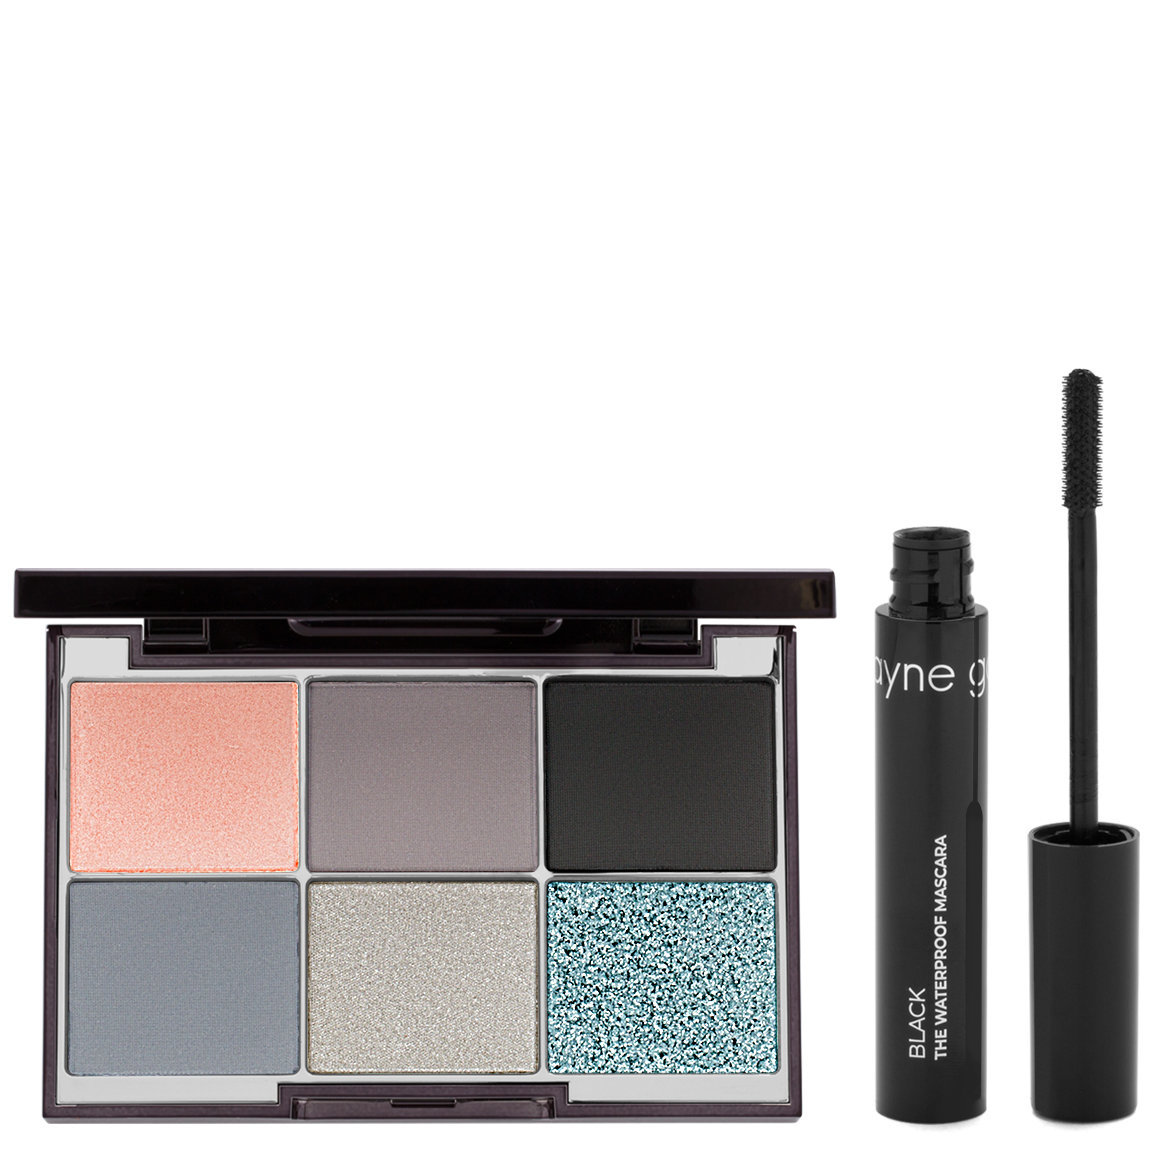 Wayne Goss Pearl Moonstone Luxury Eye Palette + Waterproof Mascara alternative view 1 - product swatch.